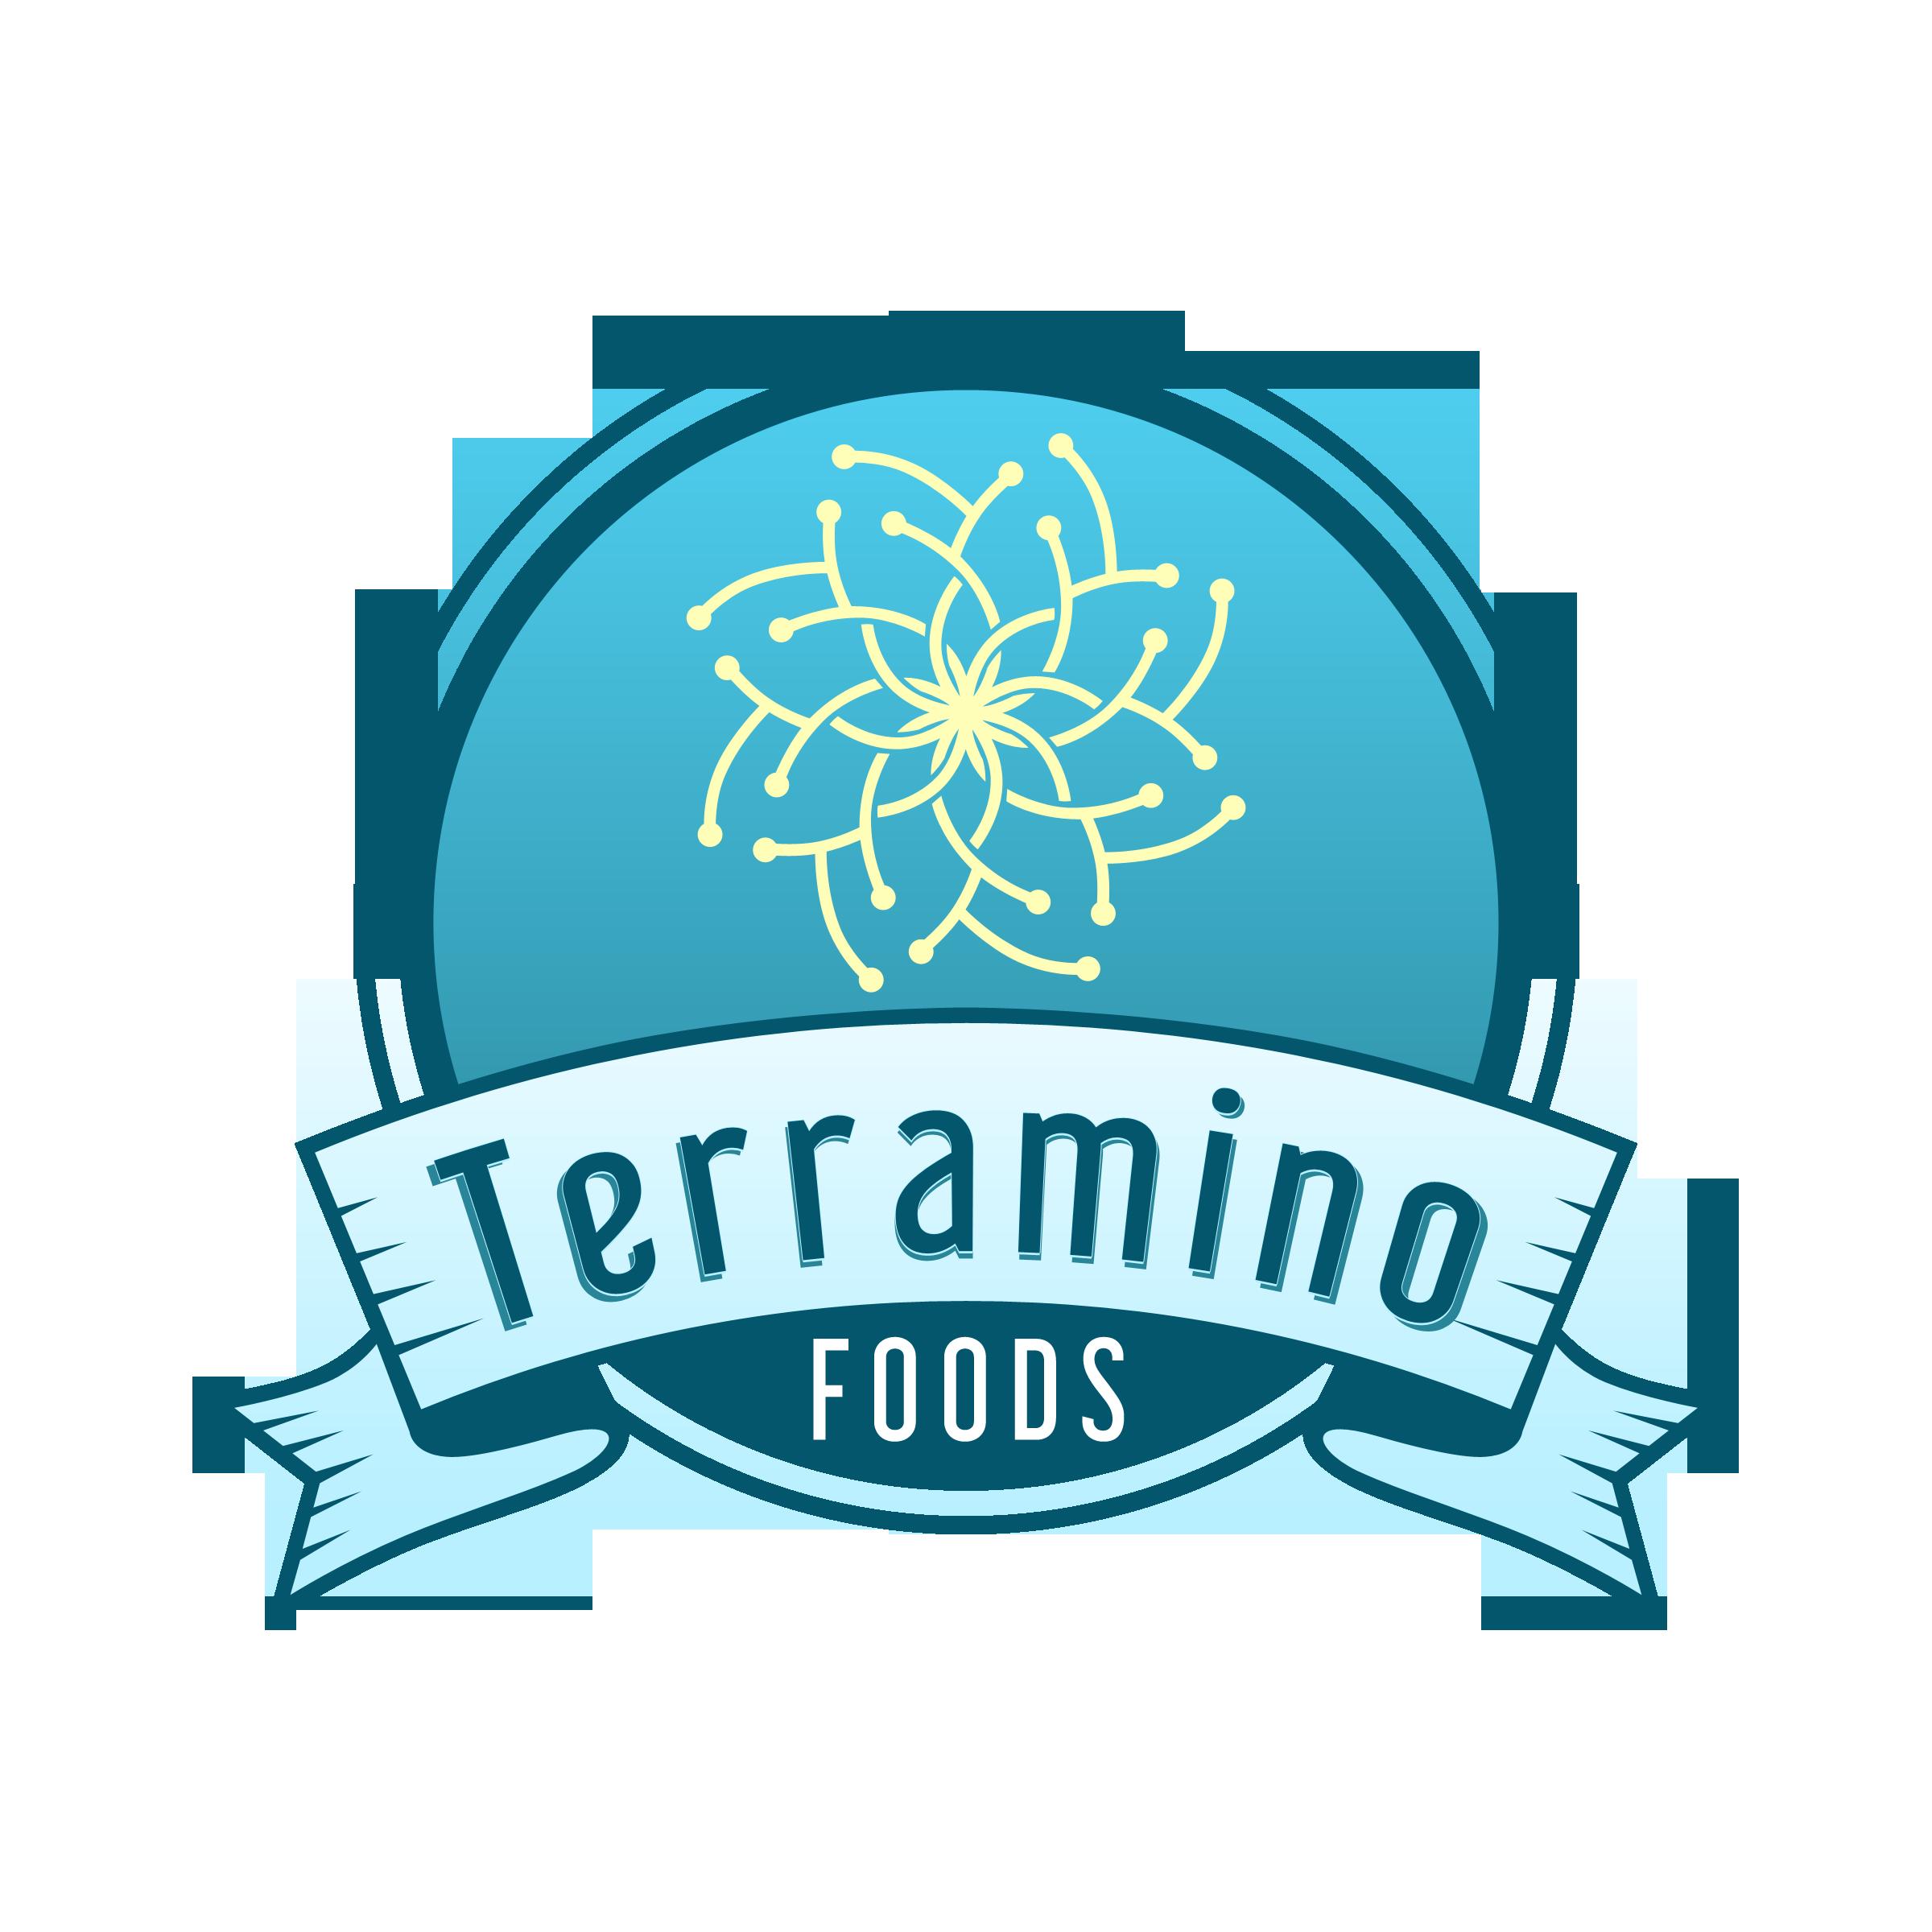 Terramino Foods